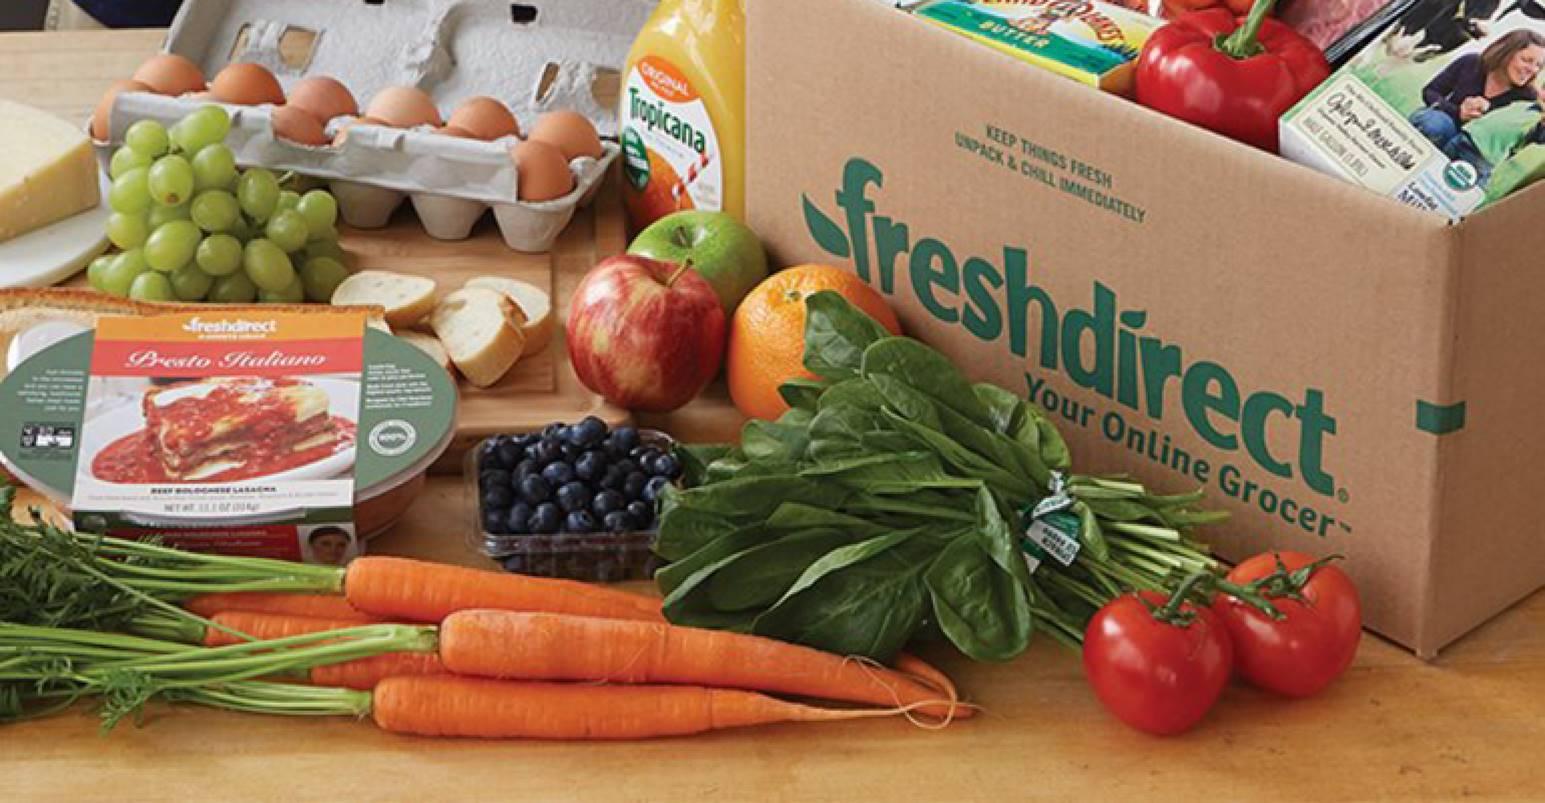 Freshdirect - Online Grocer